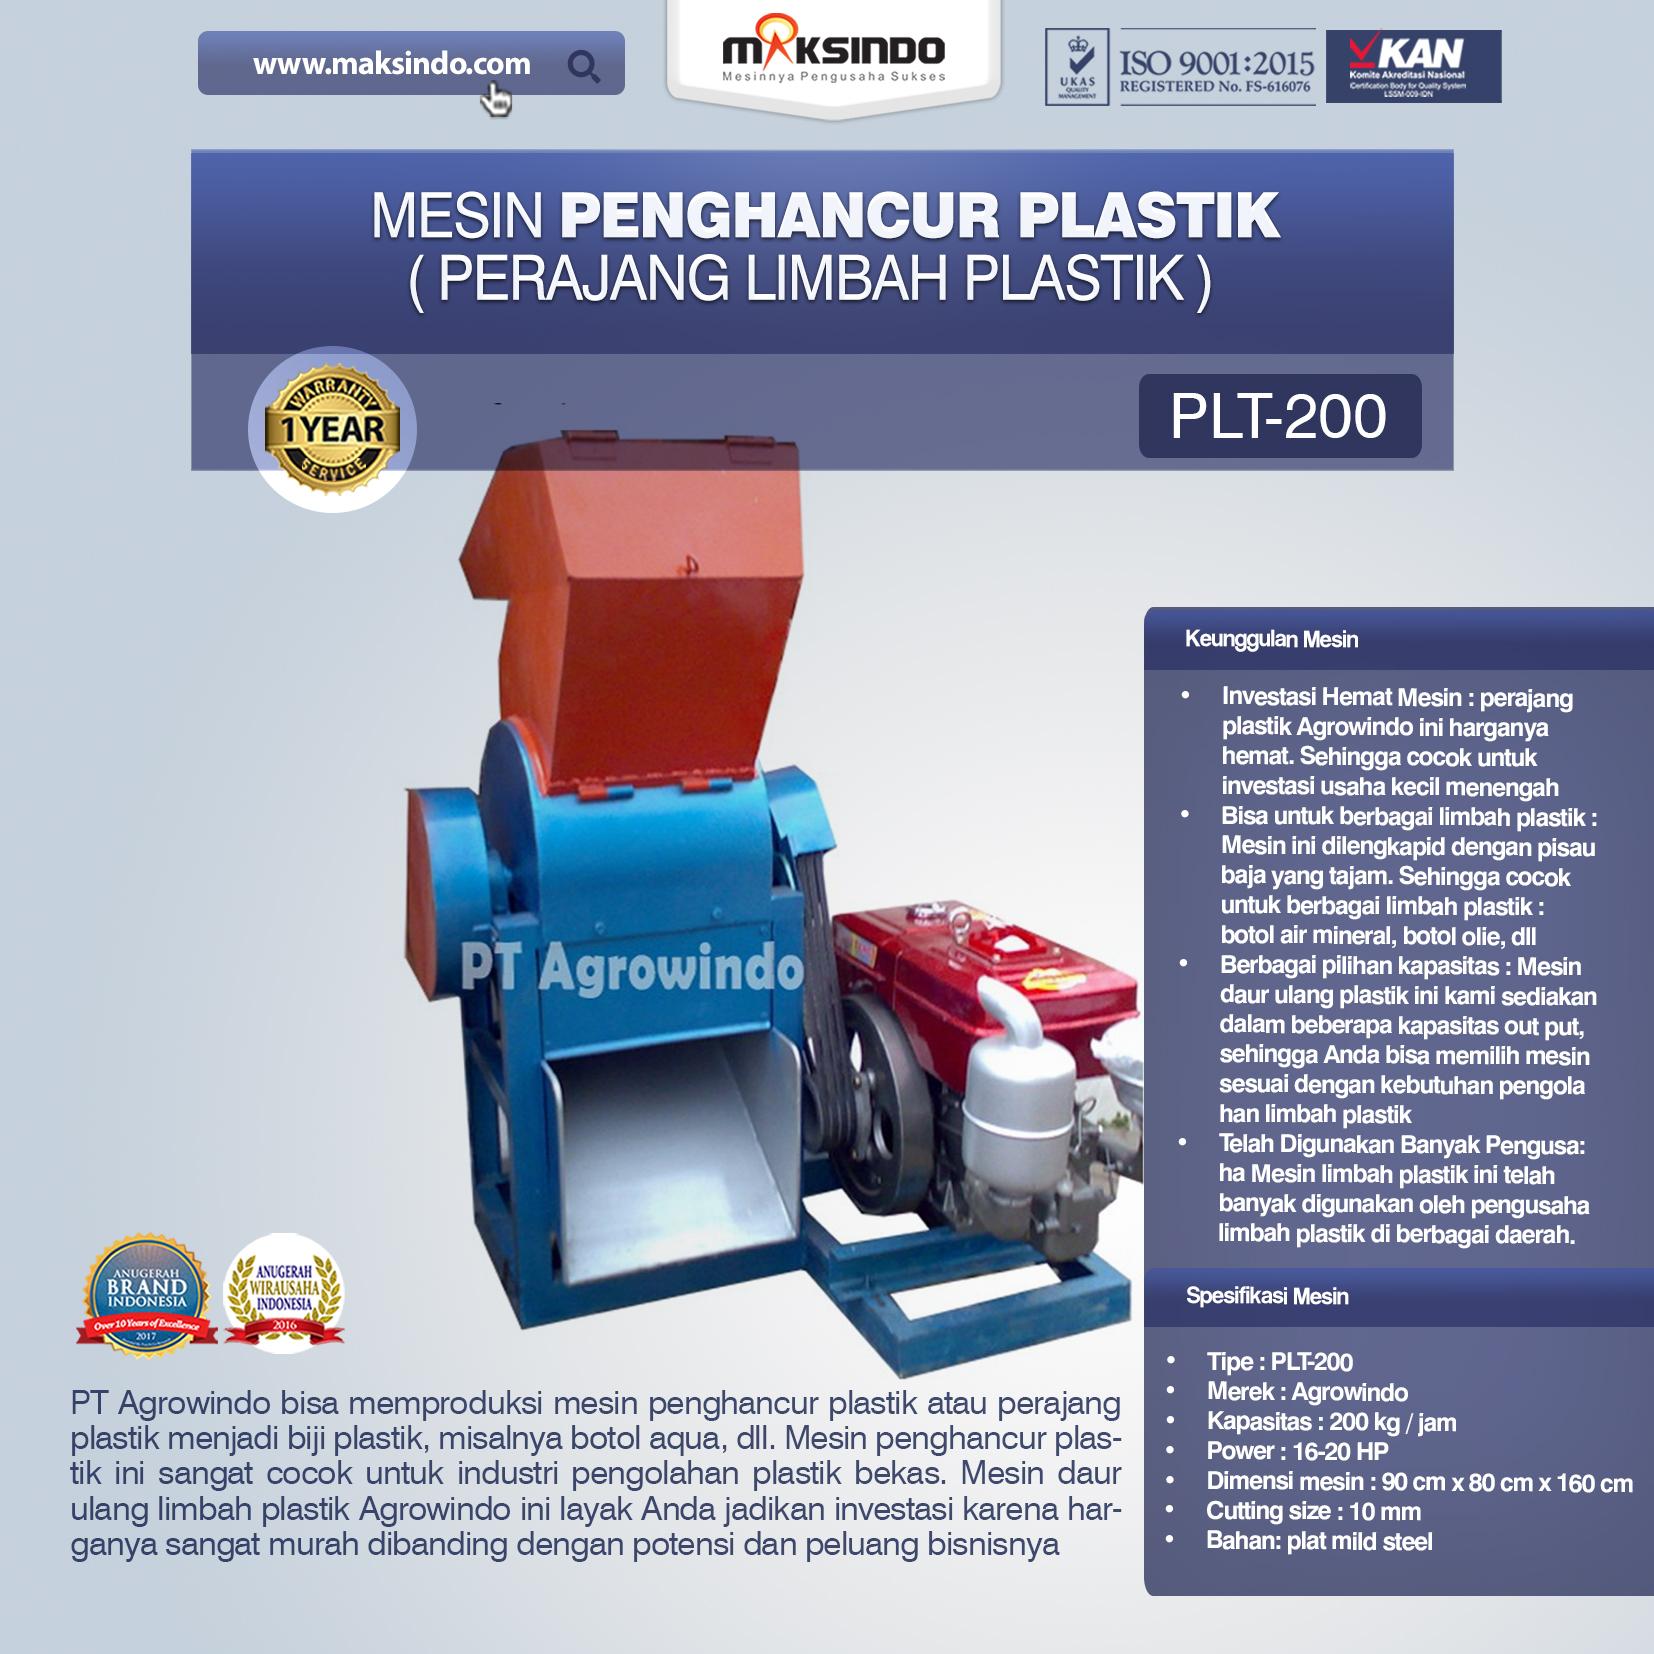 mesin penghancur plastik PLT-200